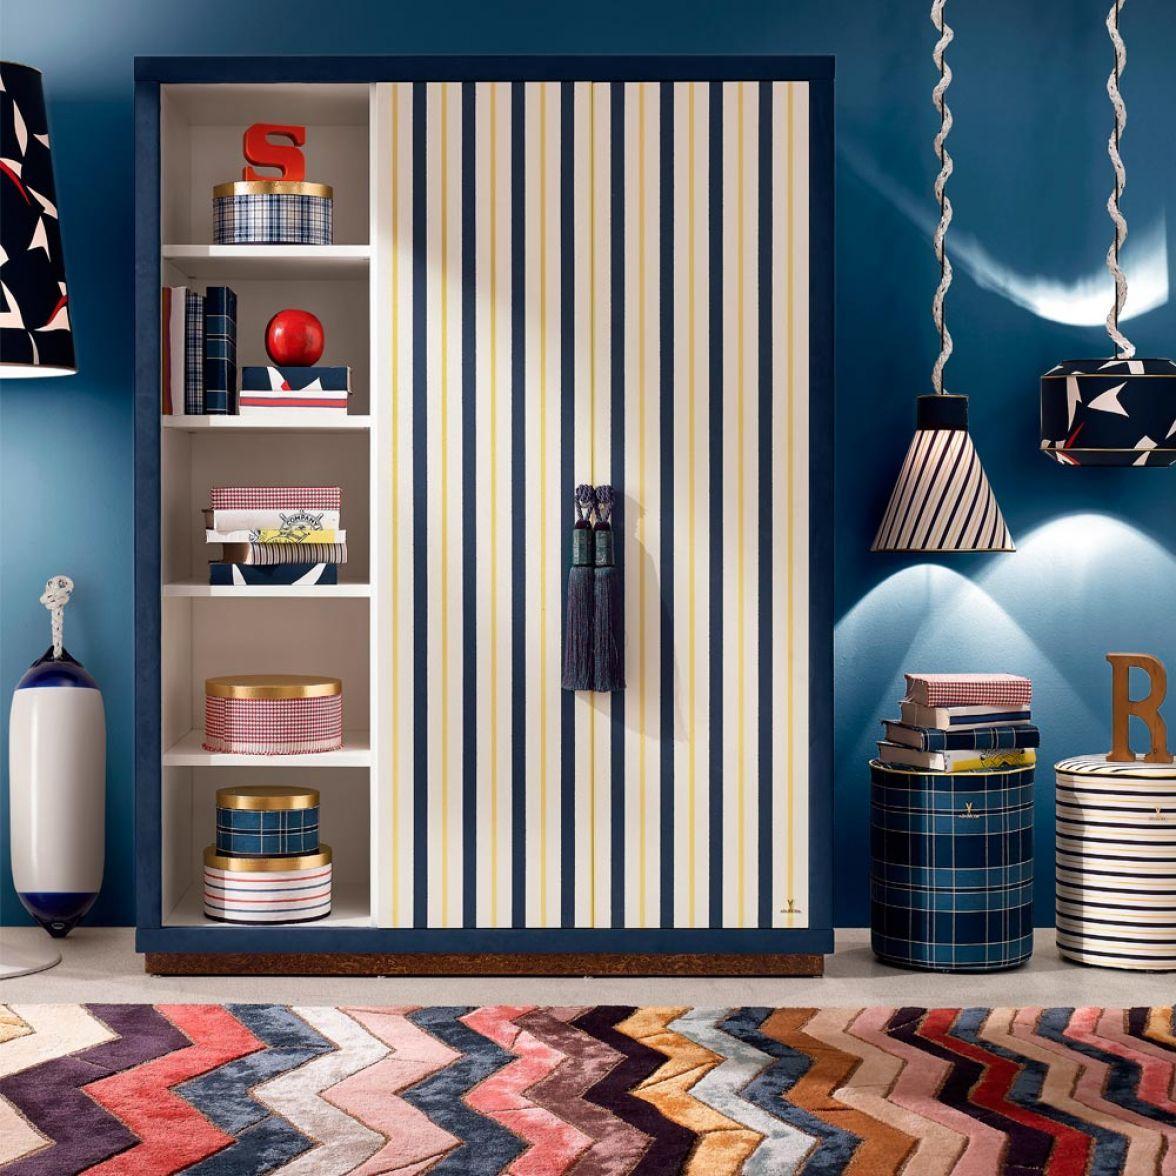 MARINE YACHT bookcase